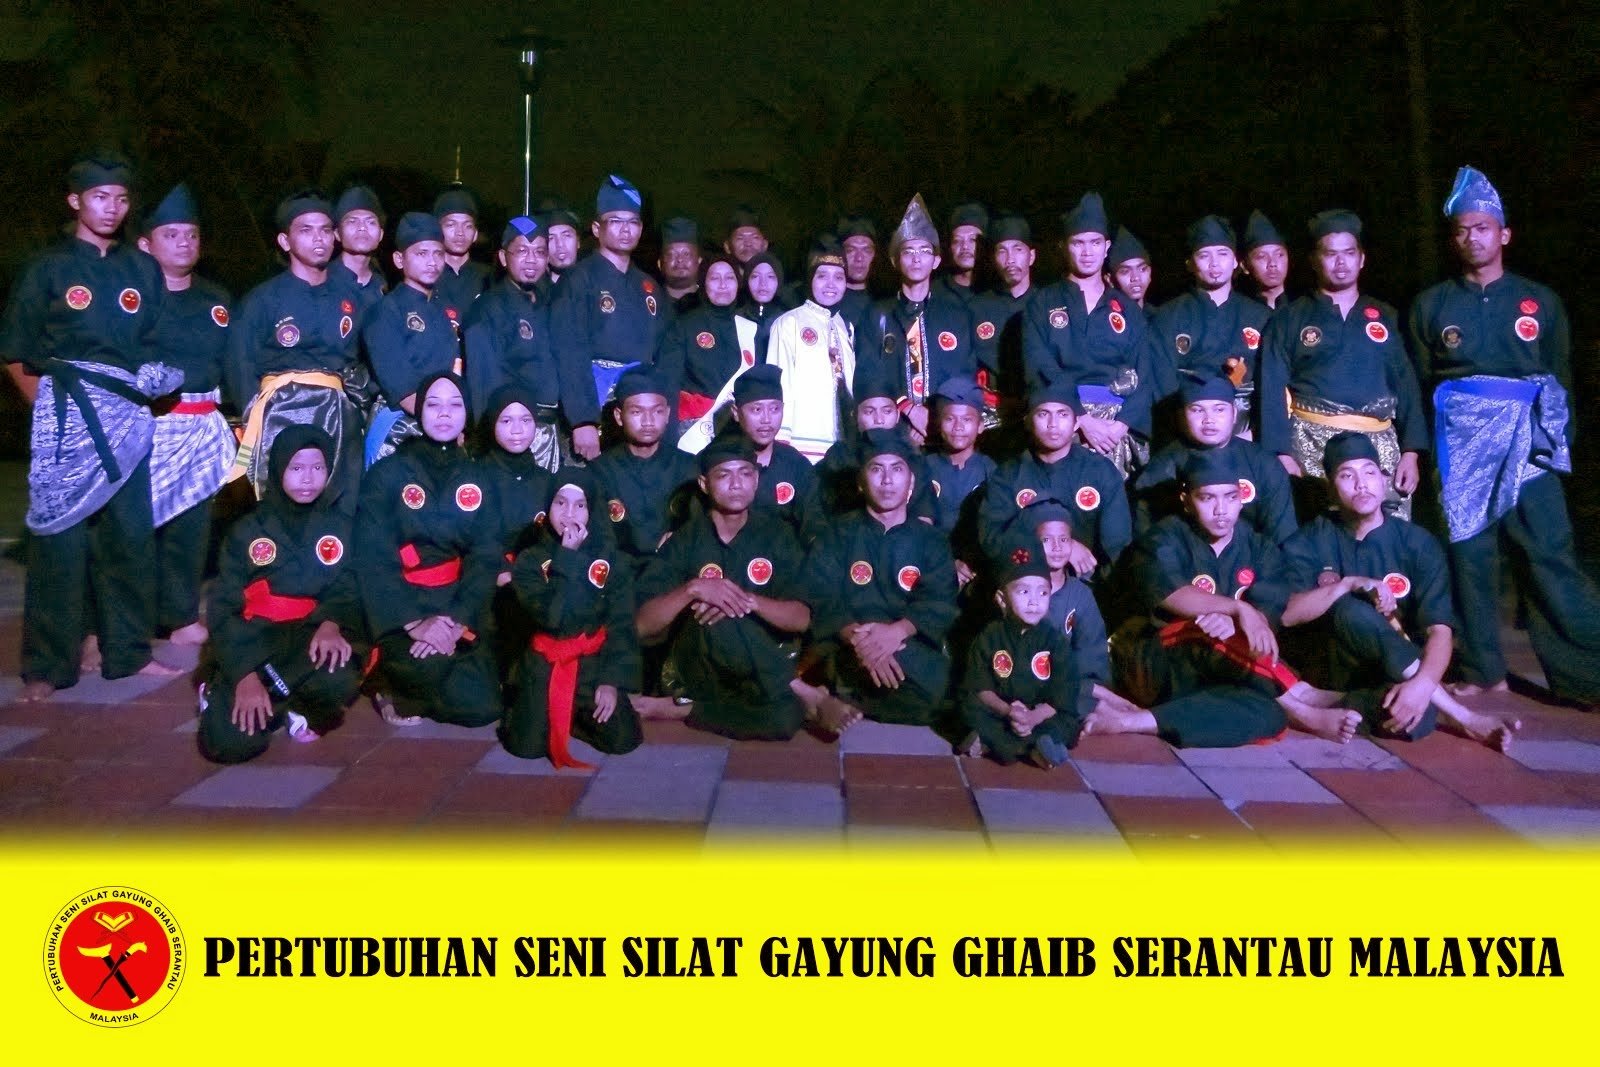 PERTUBUHAN SENI SILAT GAYUNG GHAIB SERANTAU MALAYSIA